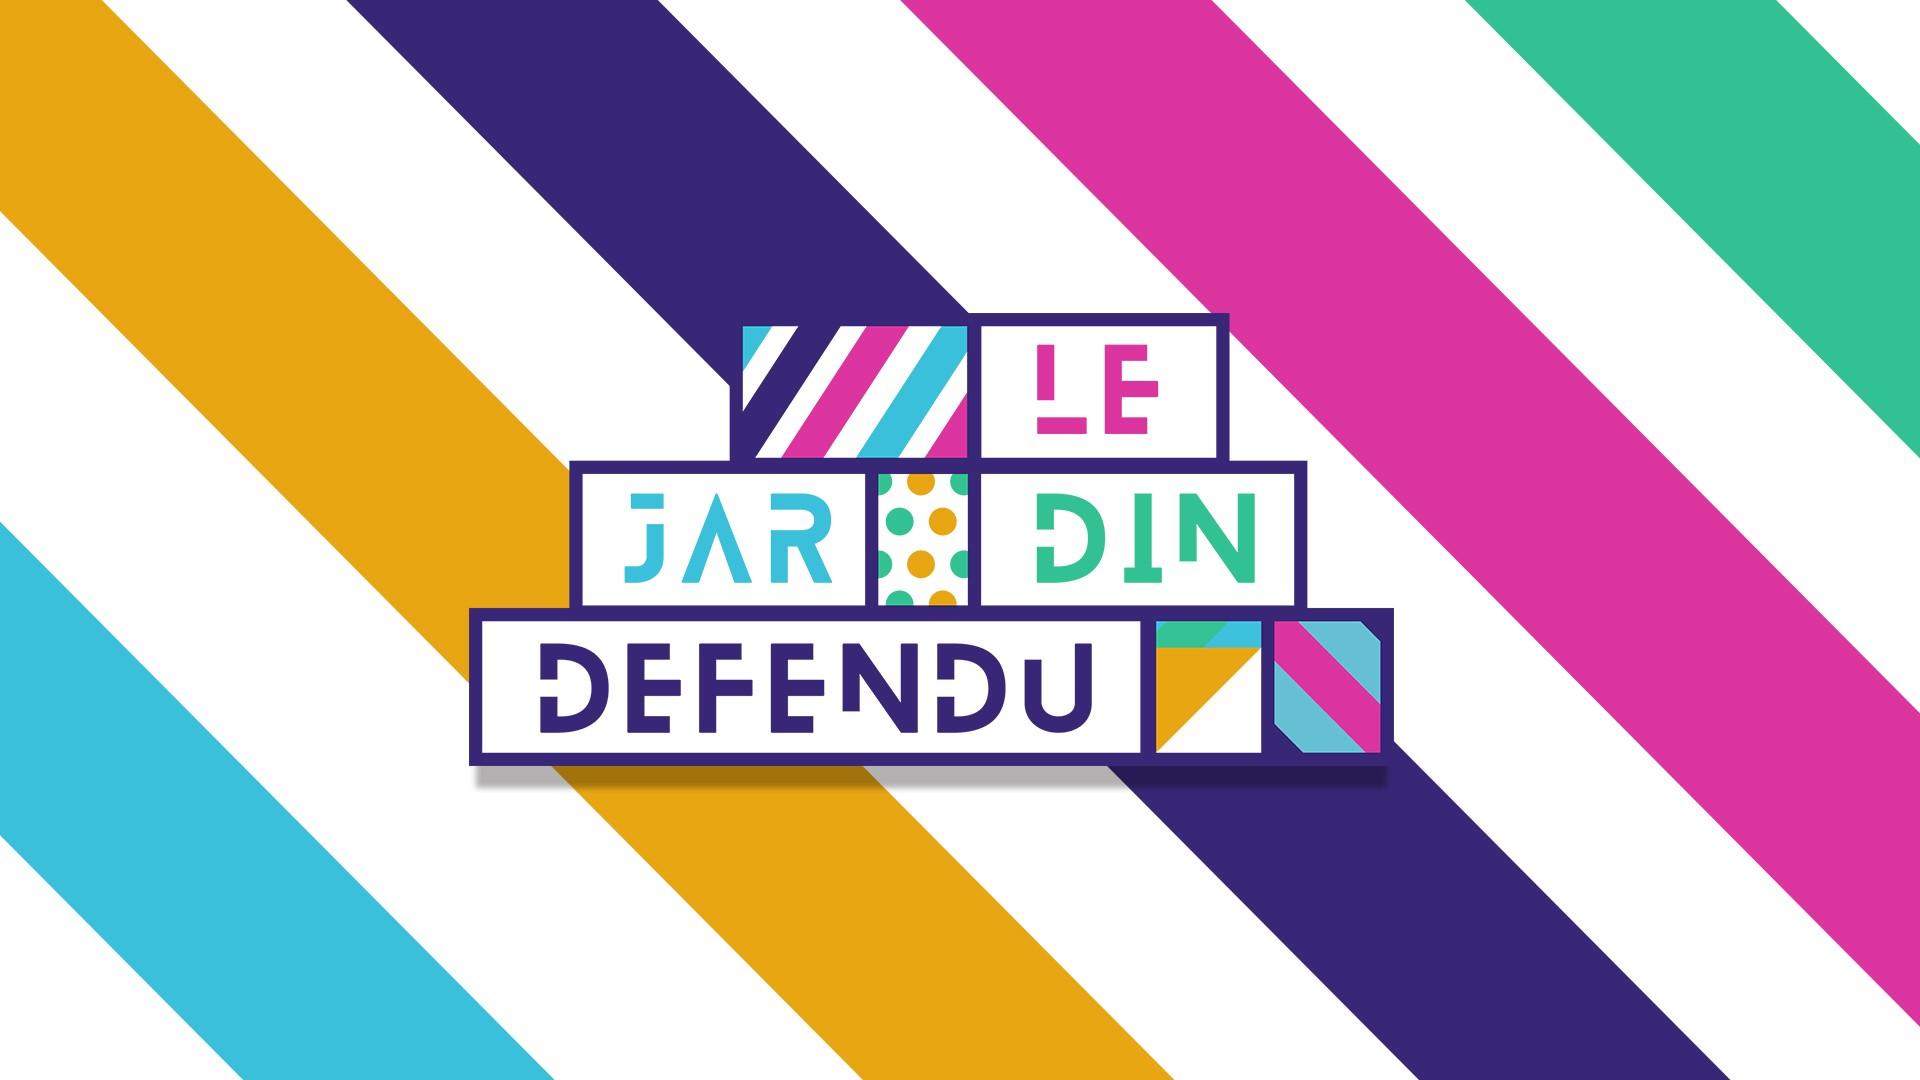 Blanka in use at La Défense!